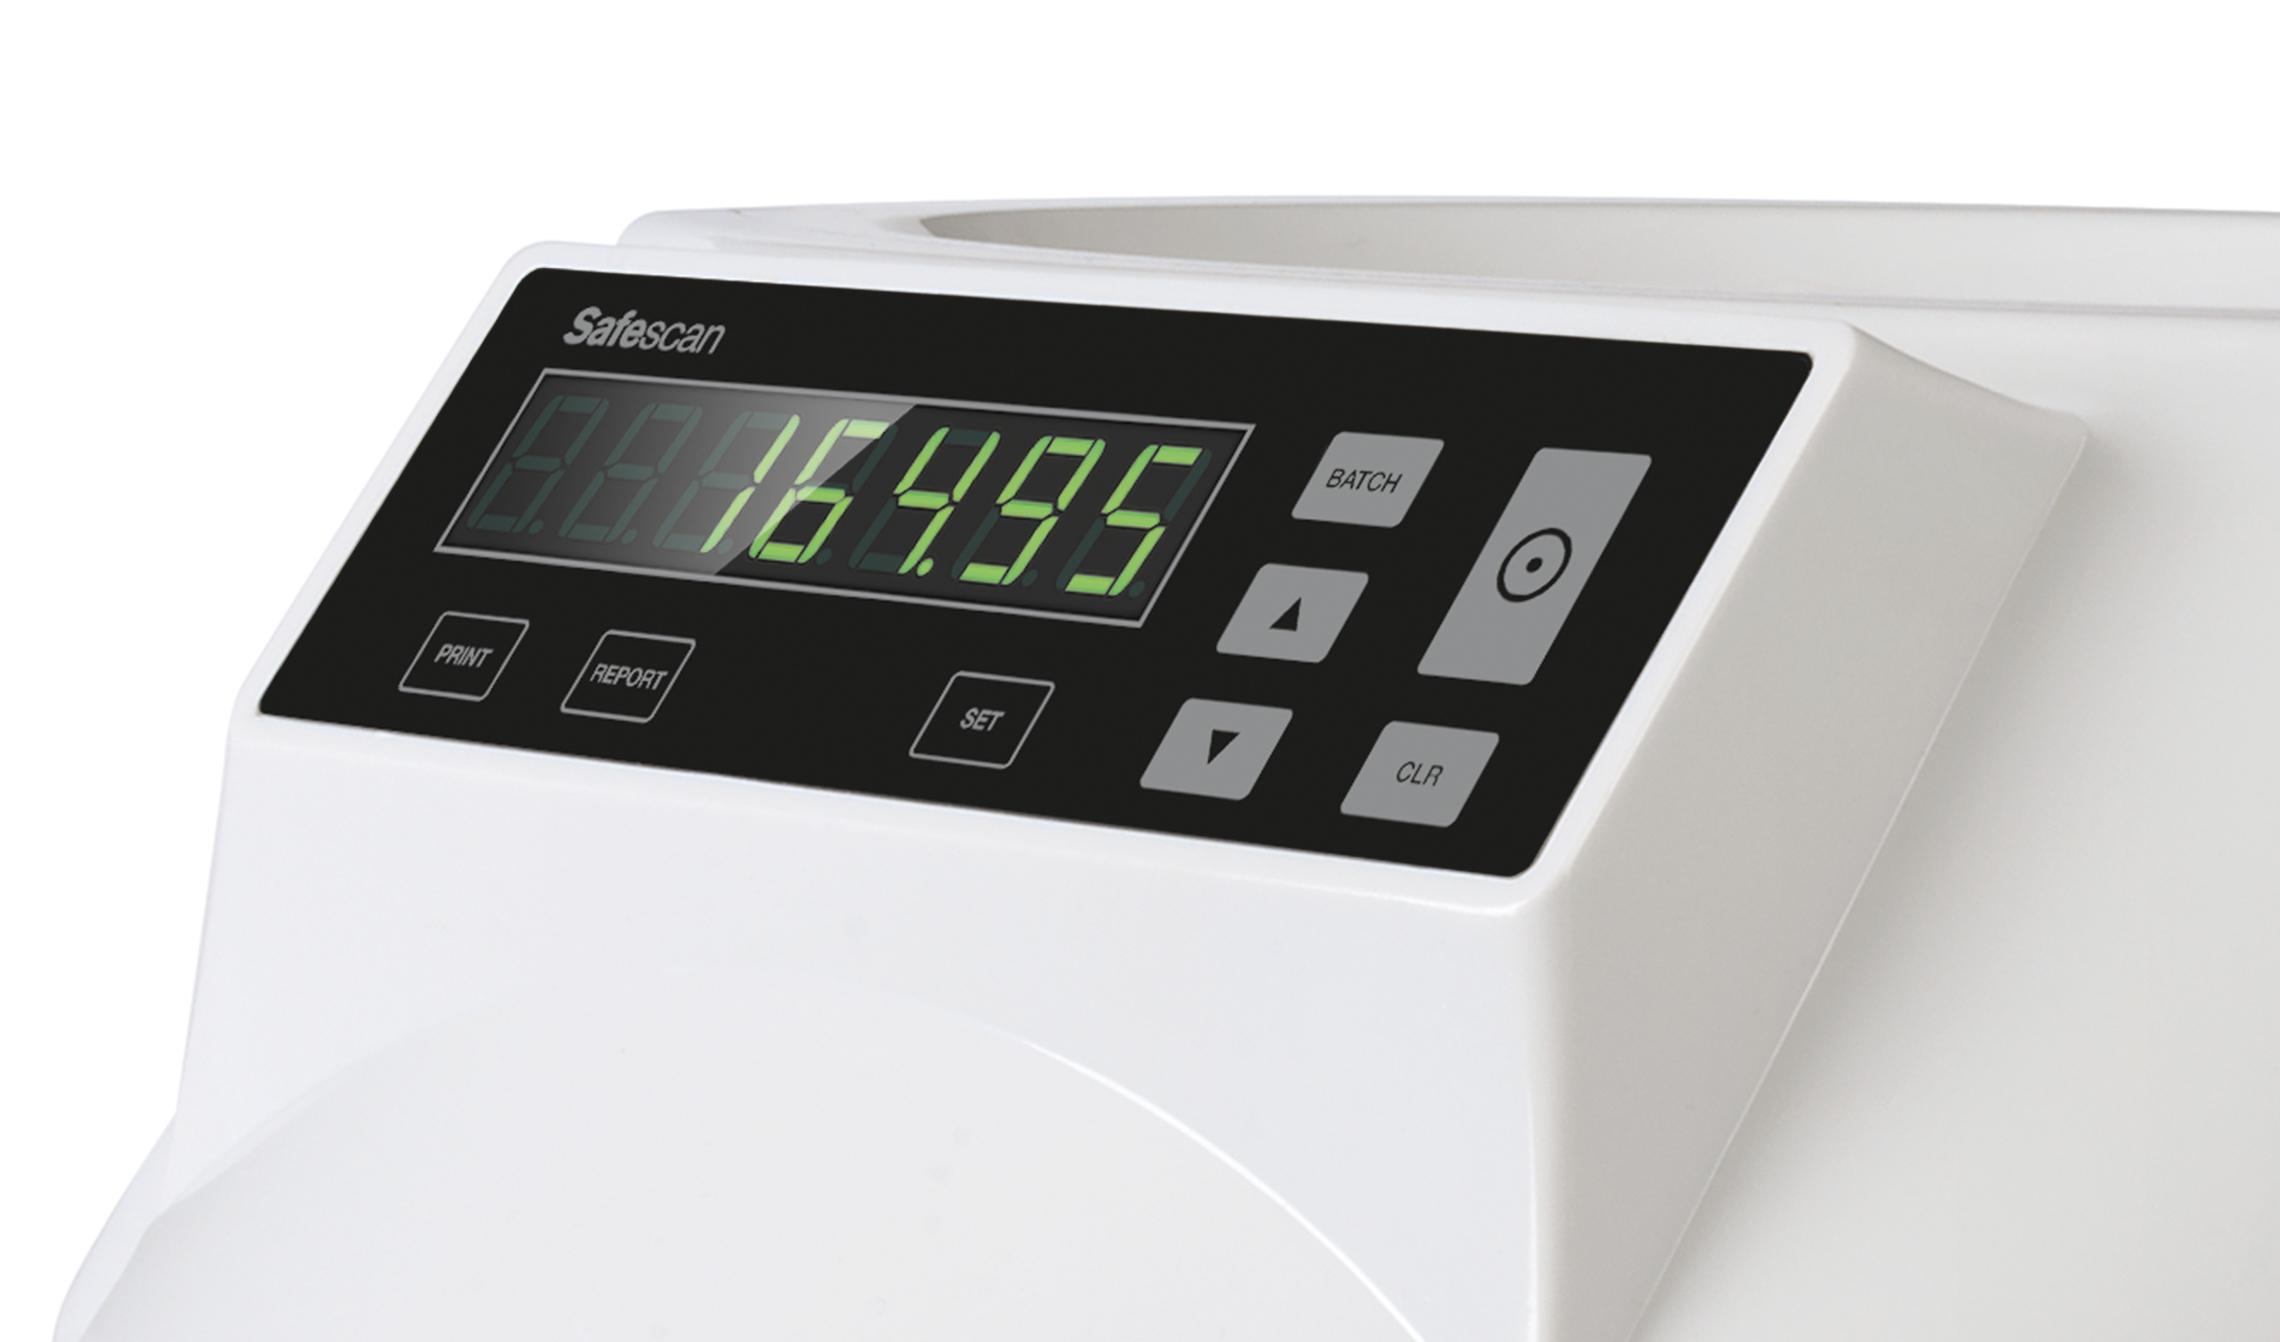 safescan-1250-eur-display